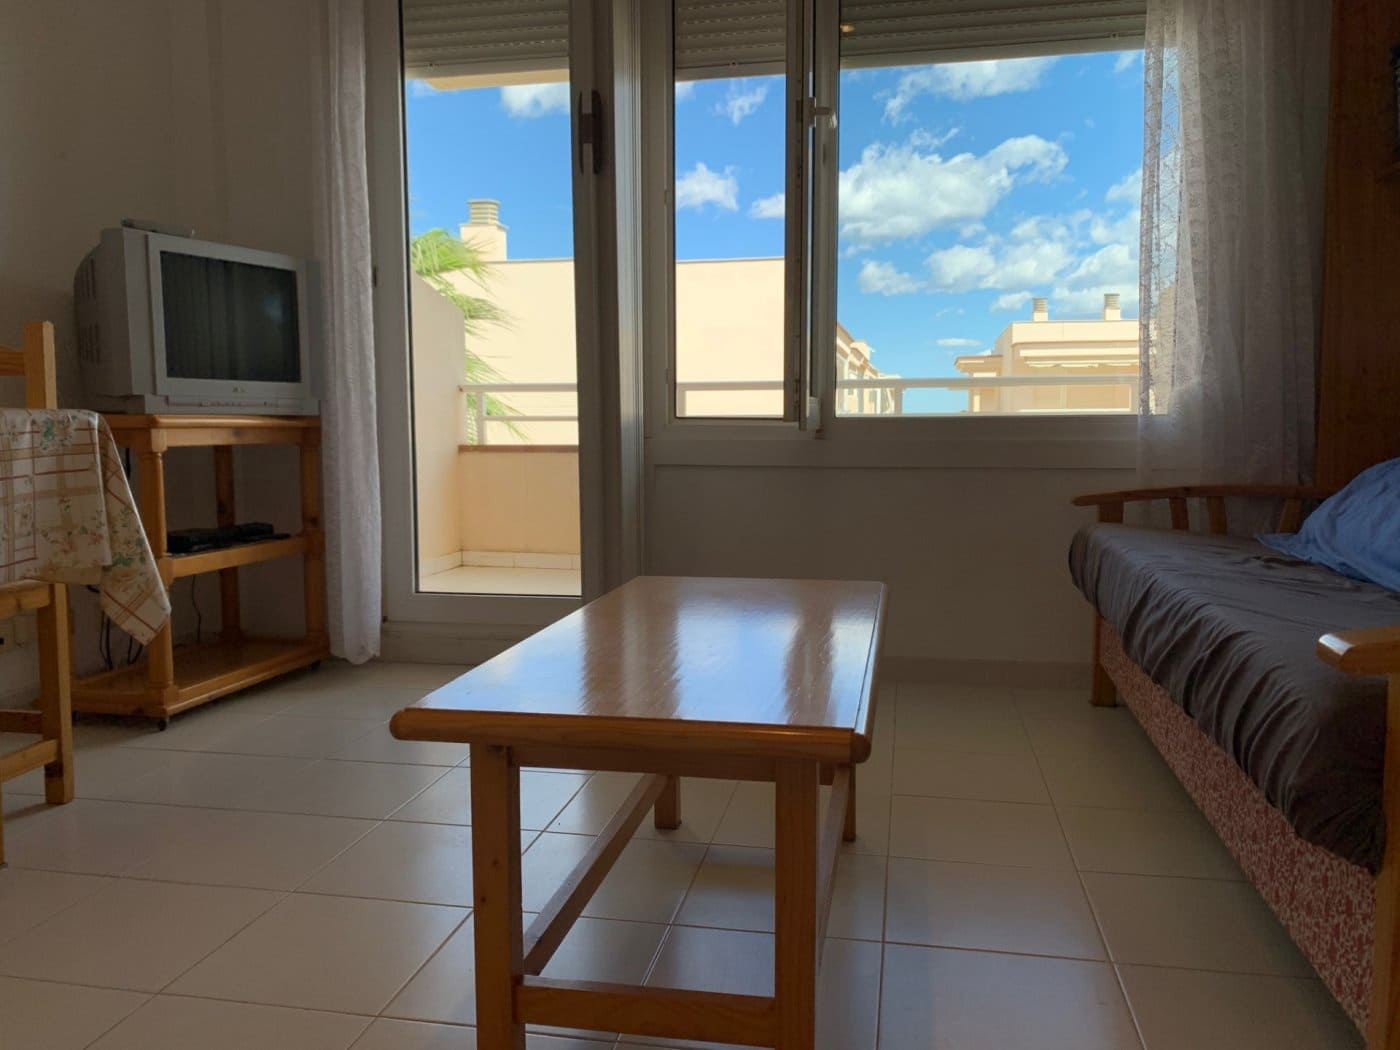 1 chambre Studio à vendre à Vinaros avec piscine garage - 63 000 € (Ref: 5600775)